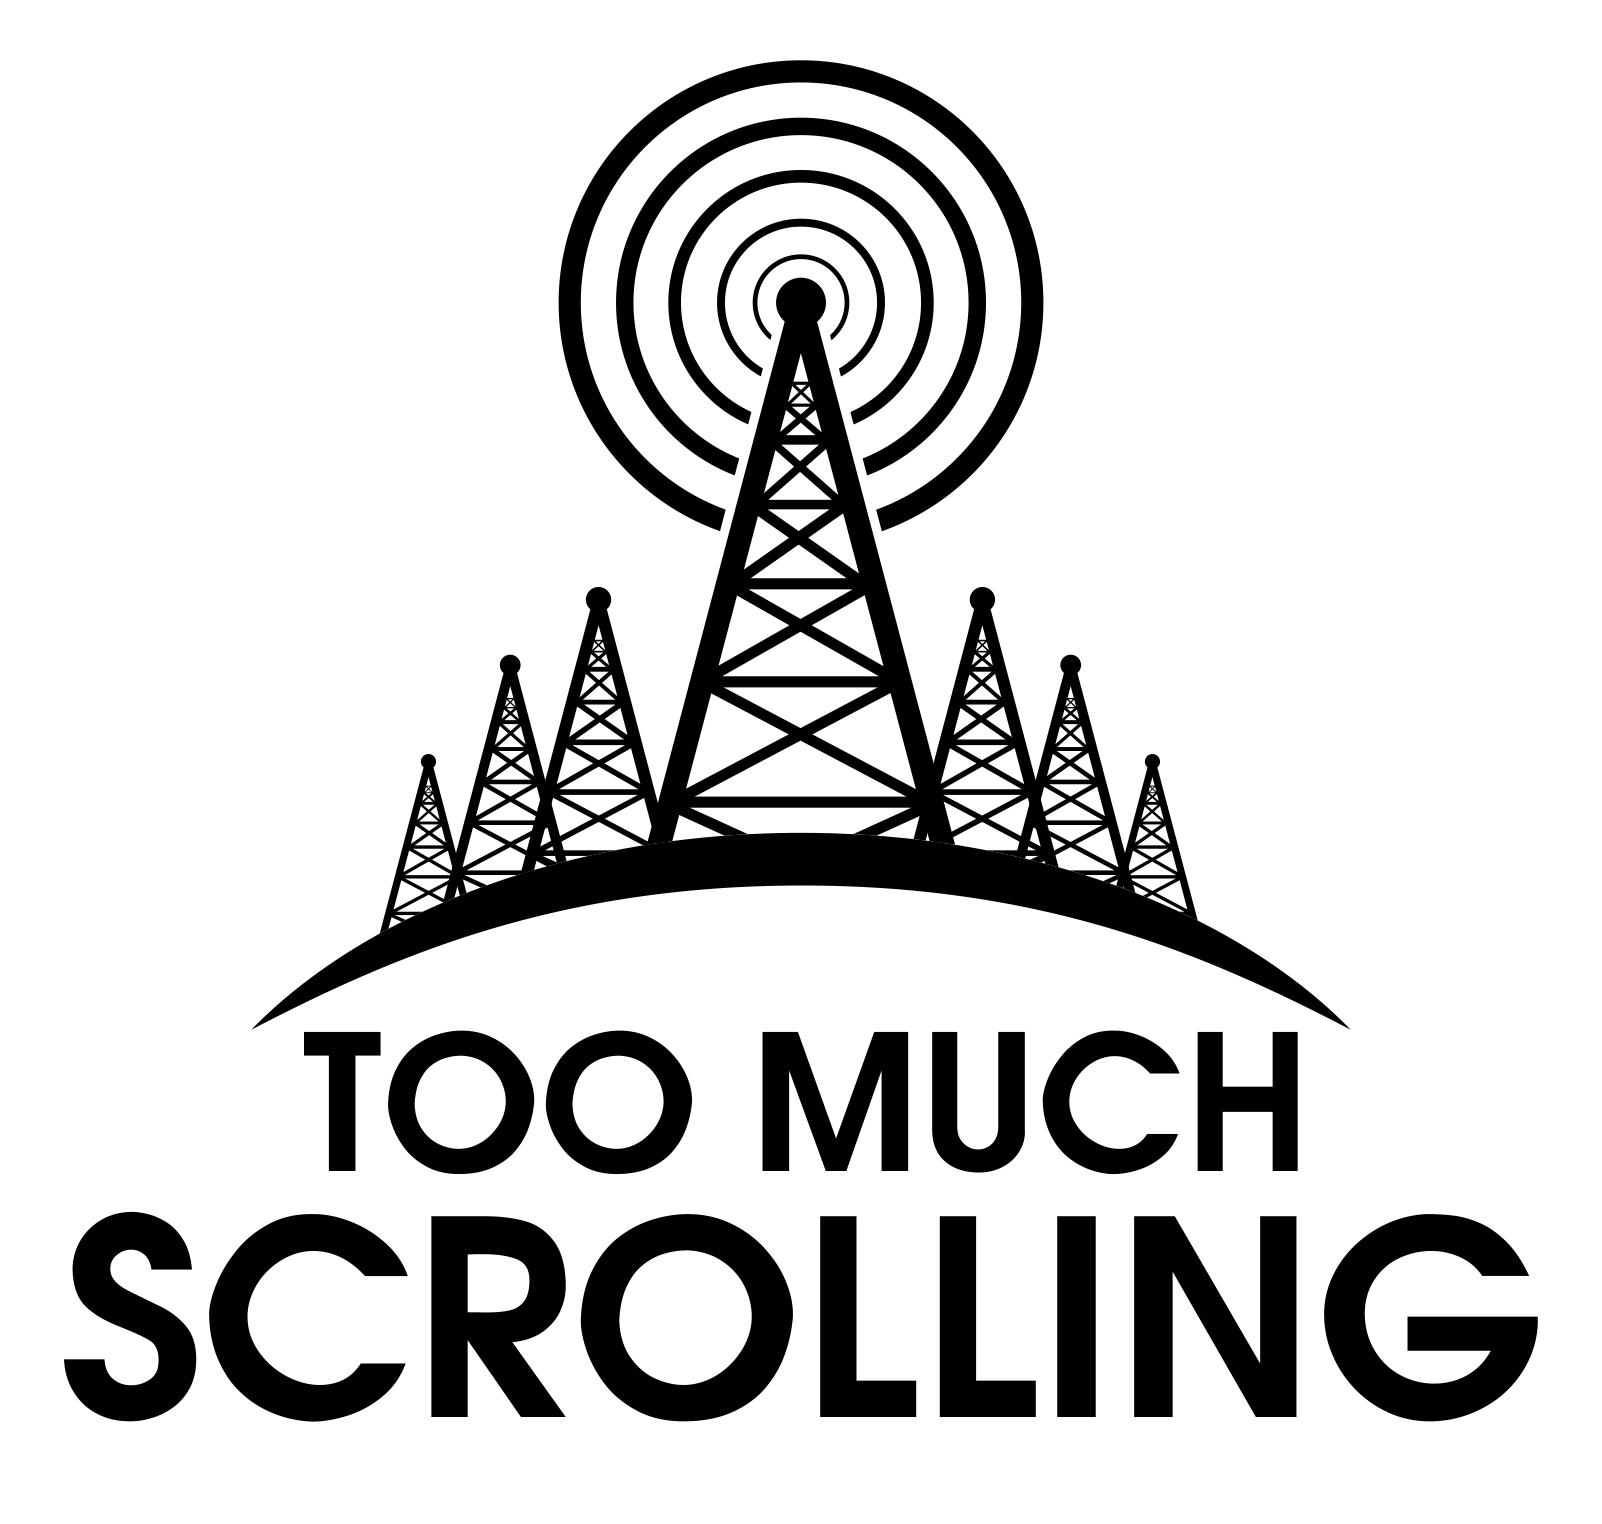 1602x1524 Too Much Scrolling.jpg